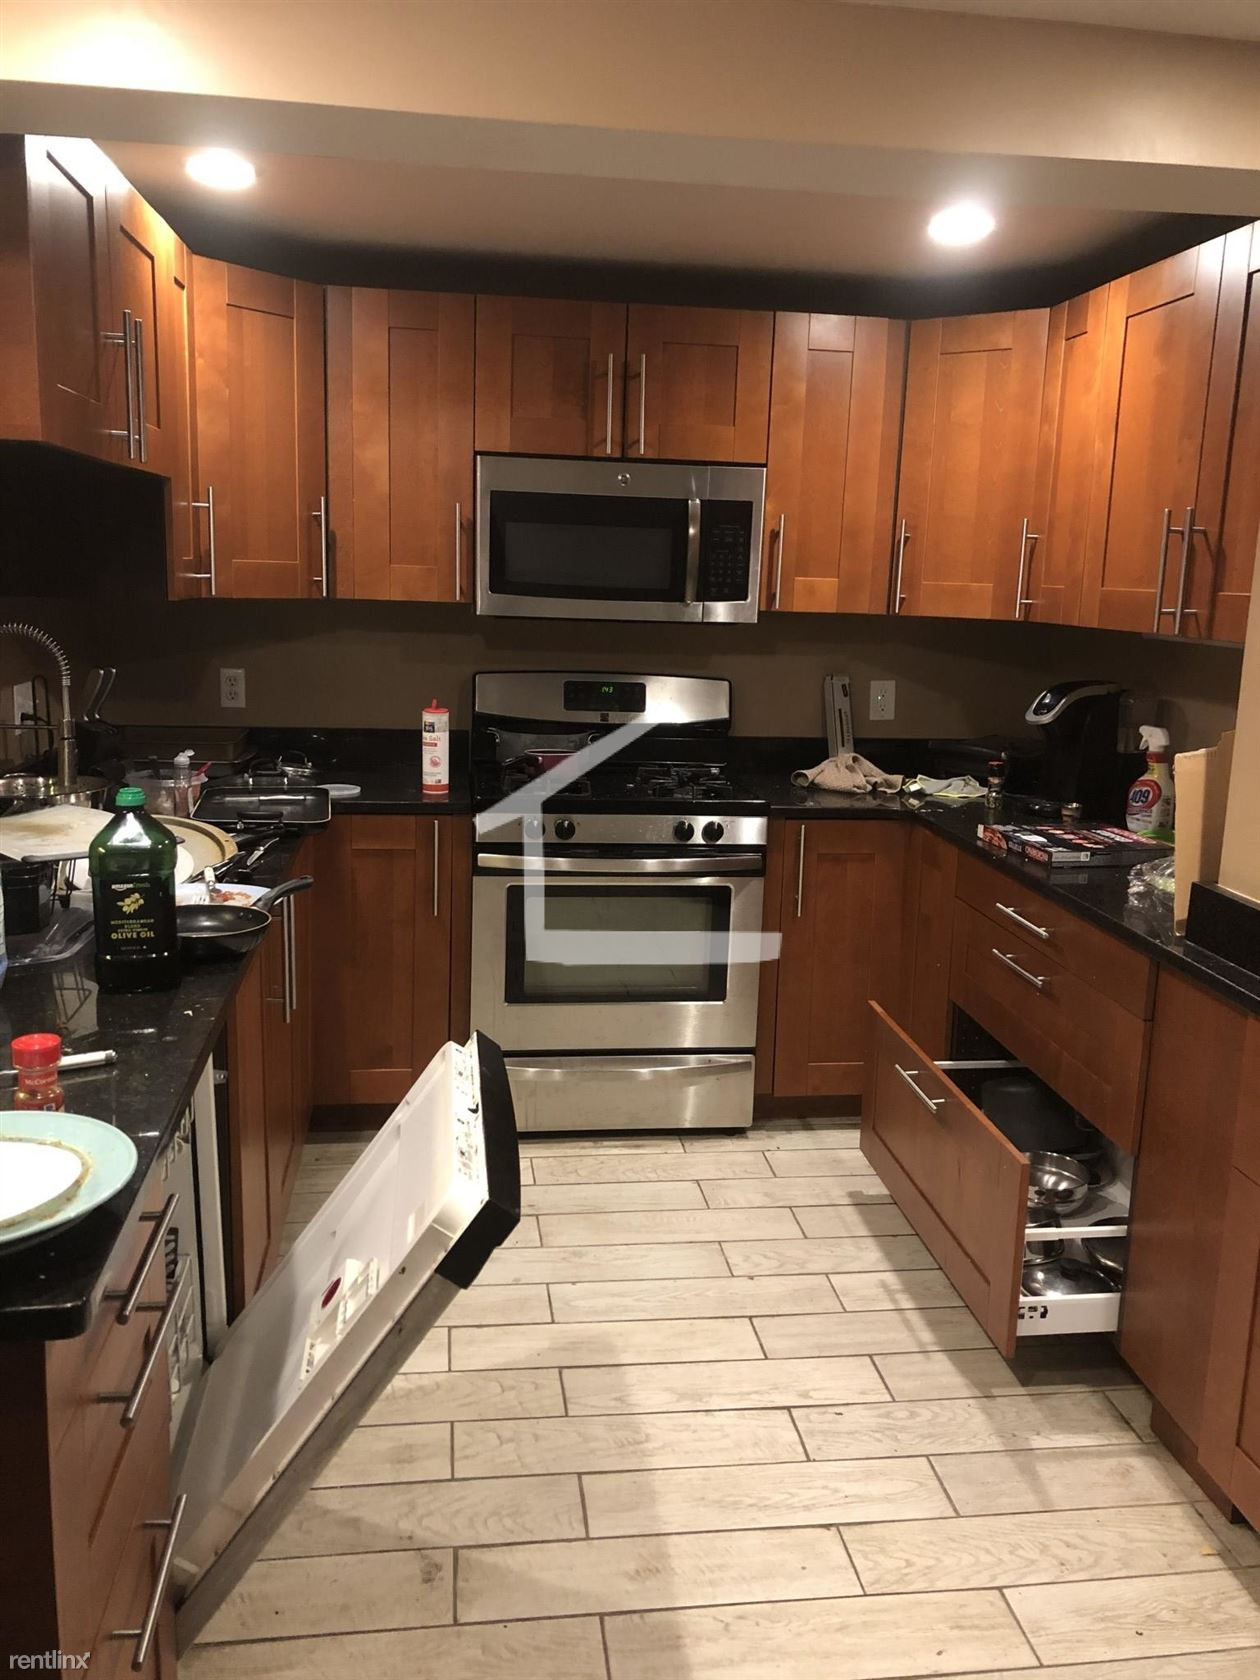 15 Saint Lukes Rd Apt Ba, Allston, MA - $3,400